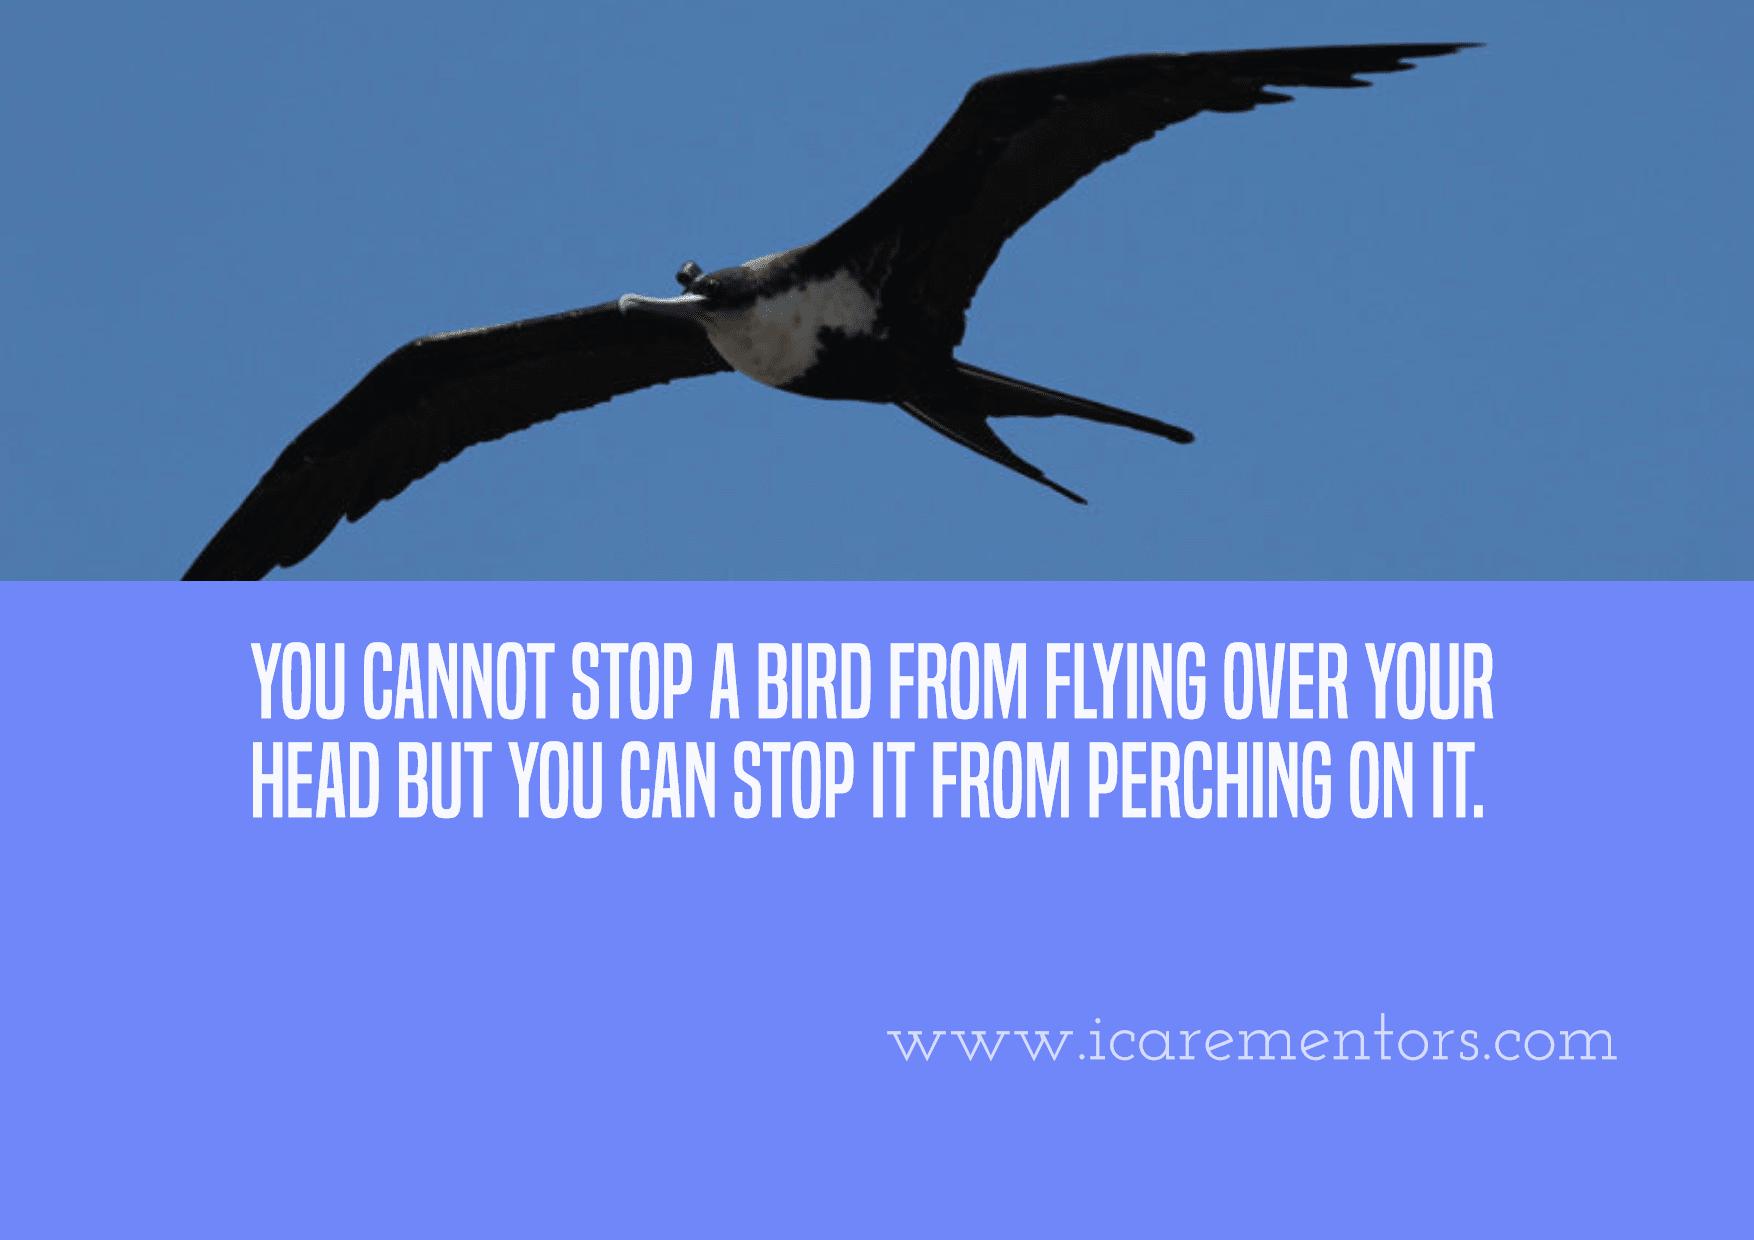 Fauna,                Bird,                Beak,                Sky,                Advertising,                Poster,                Text,                Quote,                Simple,                Blue,                Aqua,                 Free Image